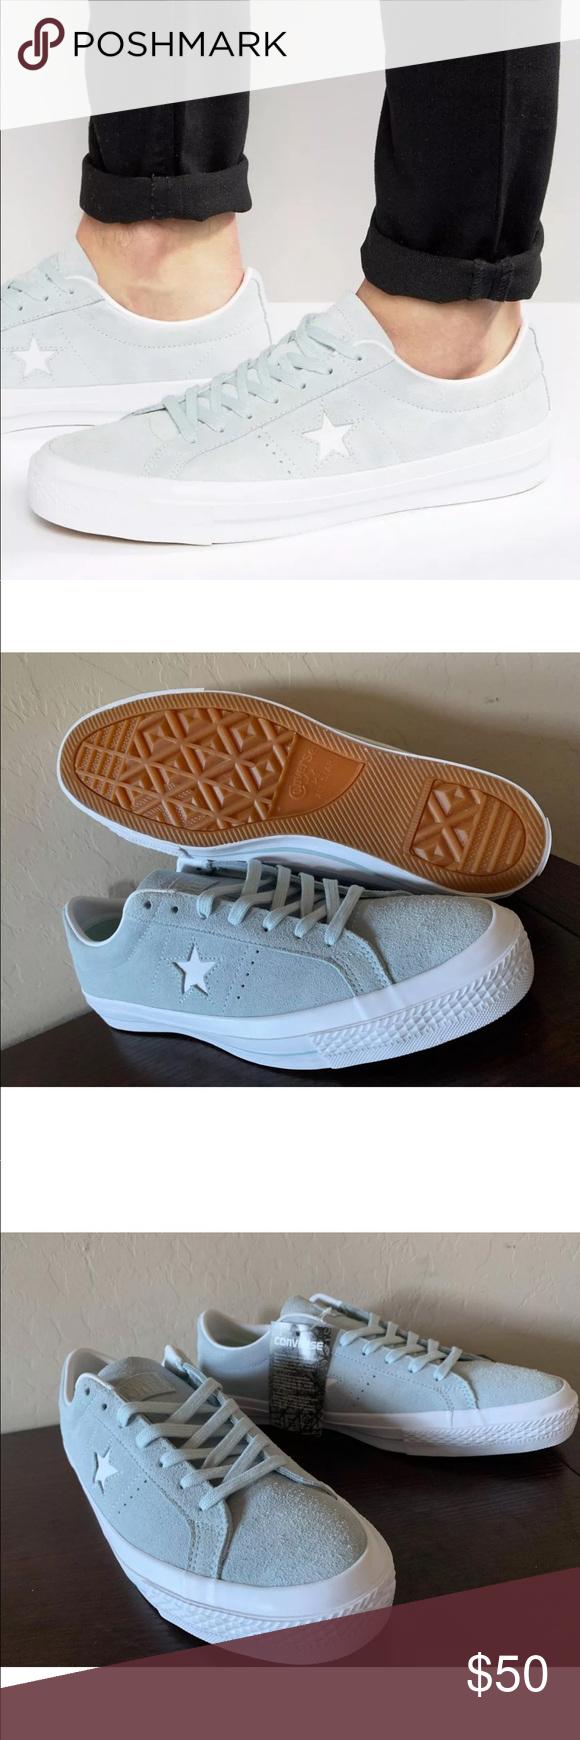 9ca8e43f811b Men s Converse One Star Suede Lunarlon Shoes NWT